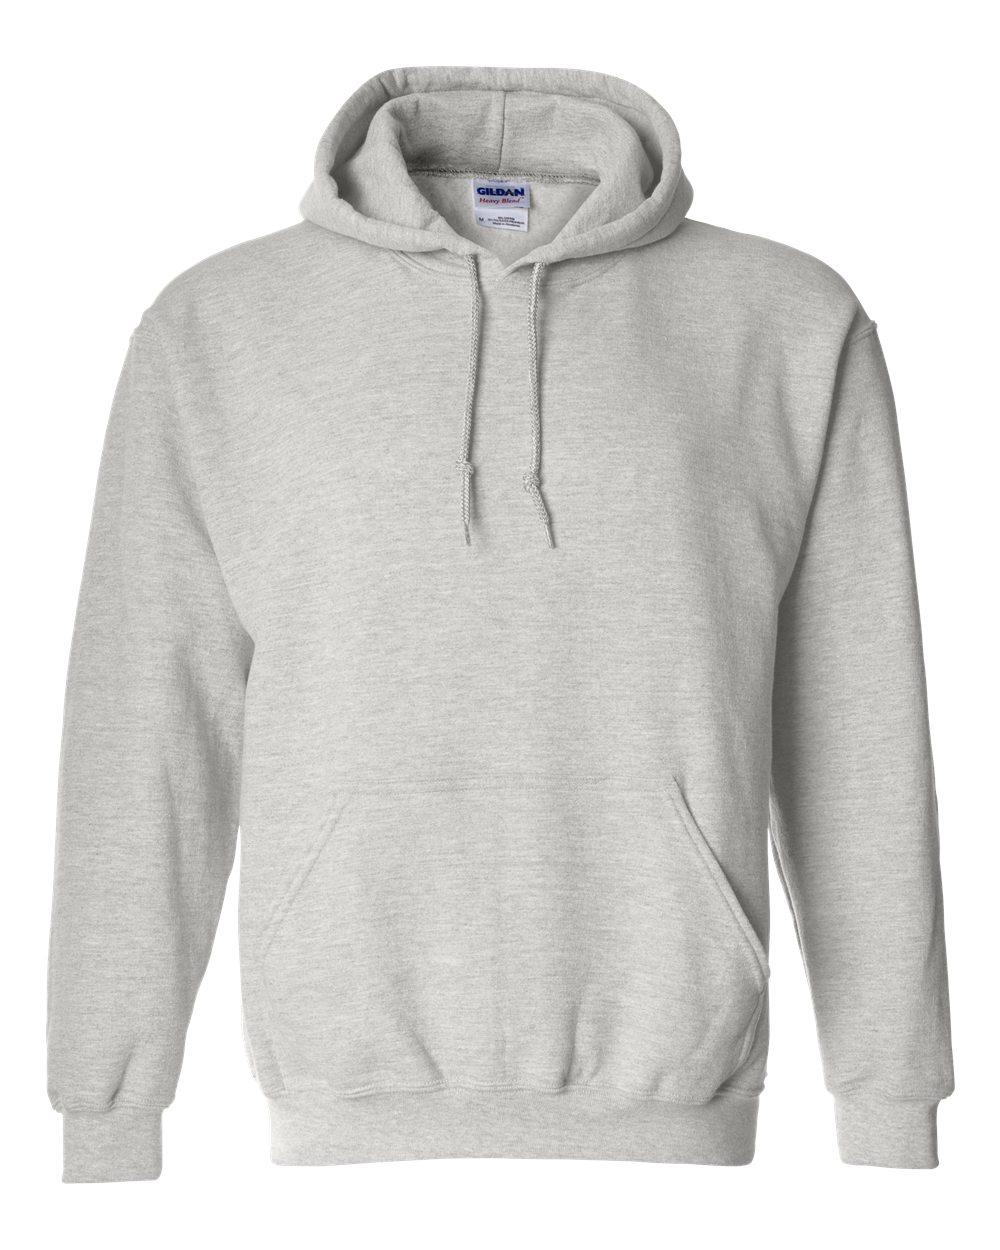 Gildan-Mens-Blank-Hoodie-Heavy-Blend-Hooded-Sweatshirt-18500-up-to-5XL thumbnail 12